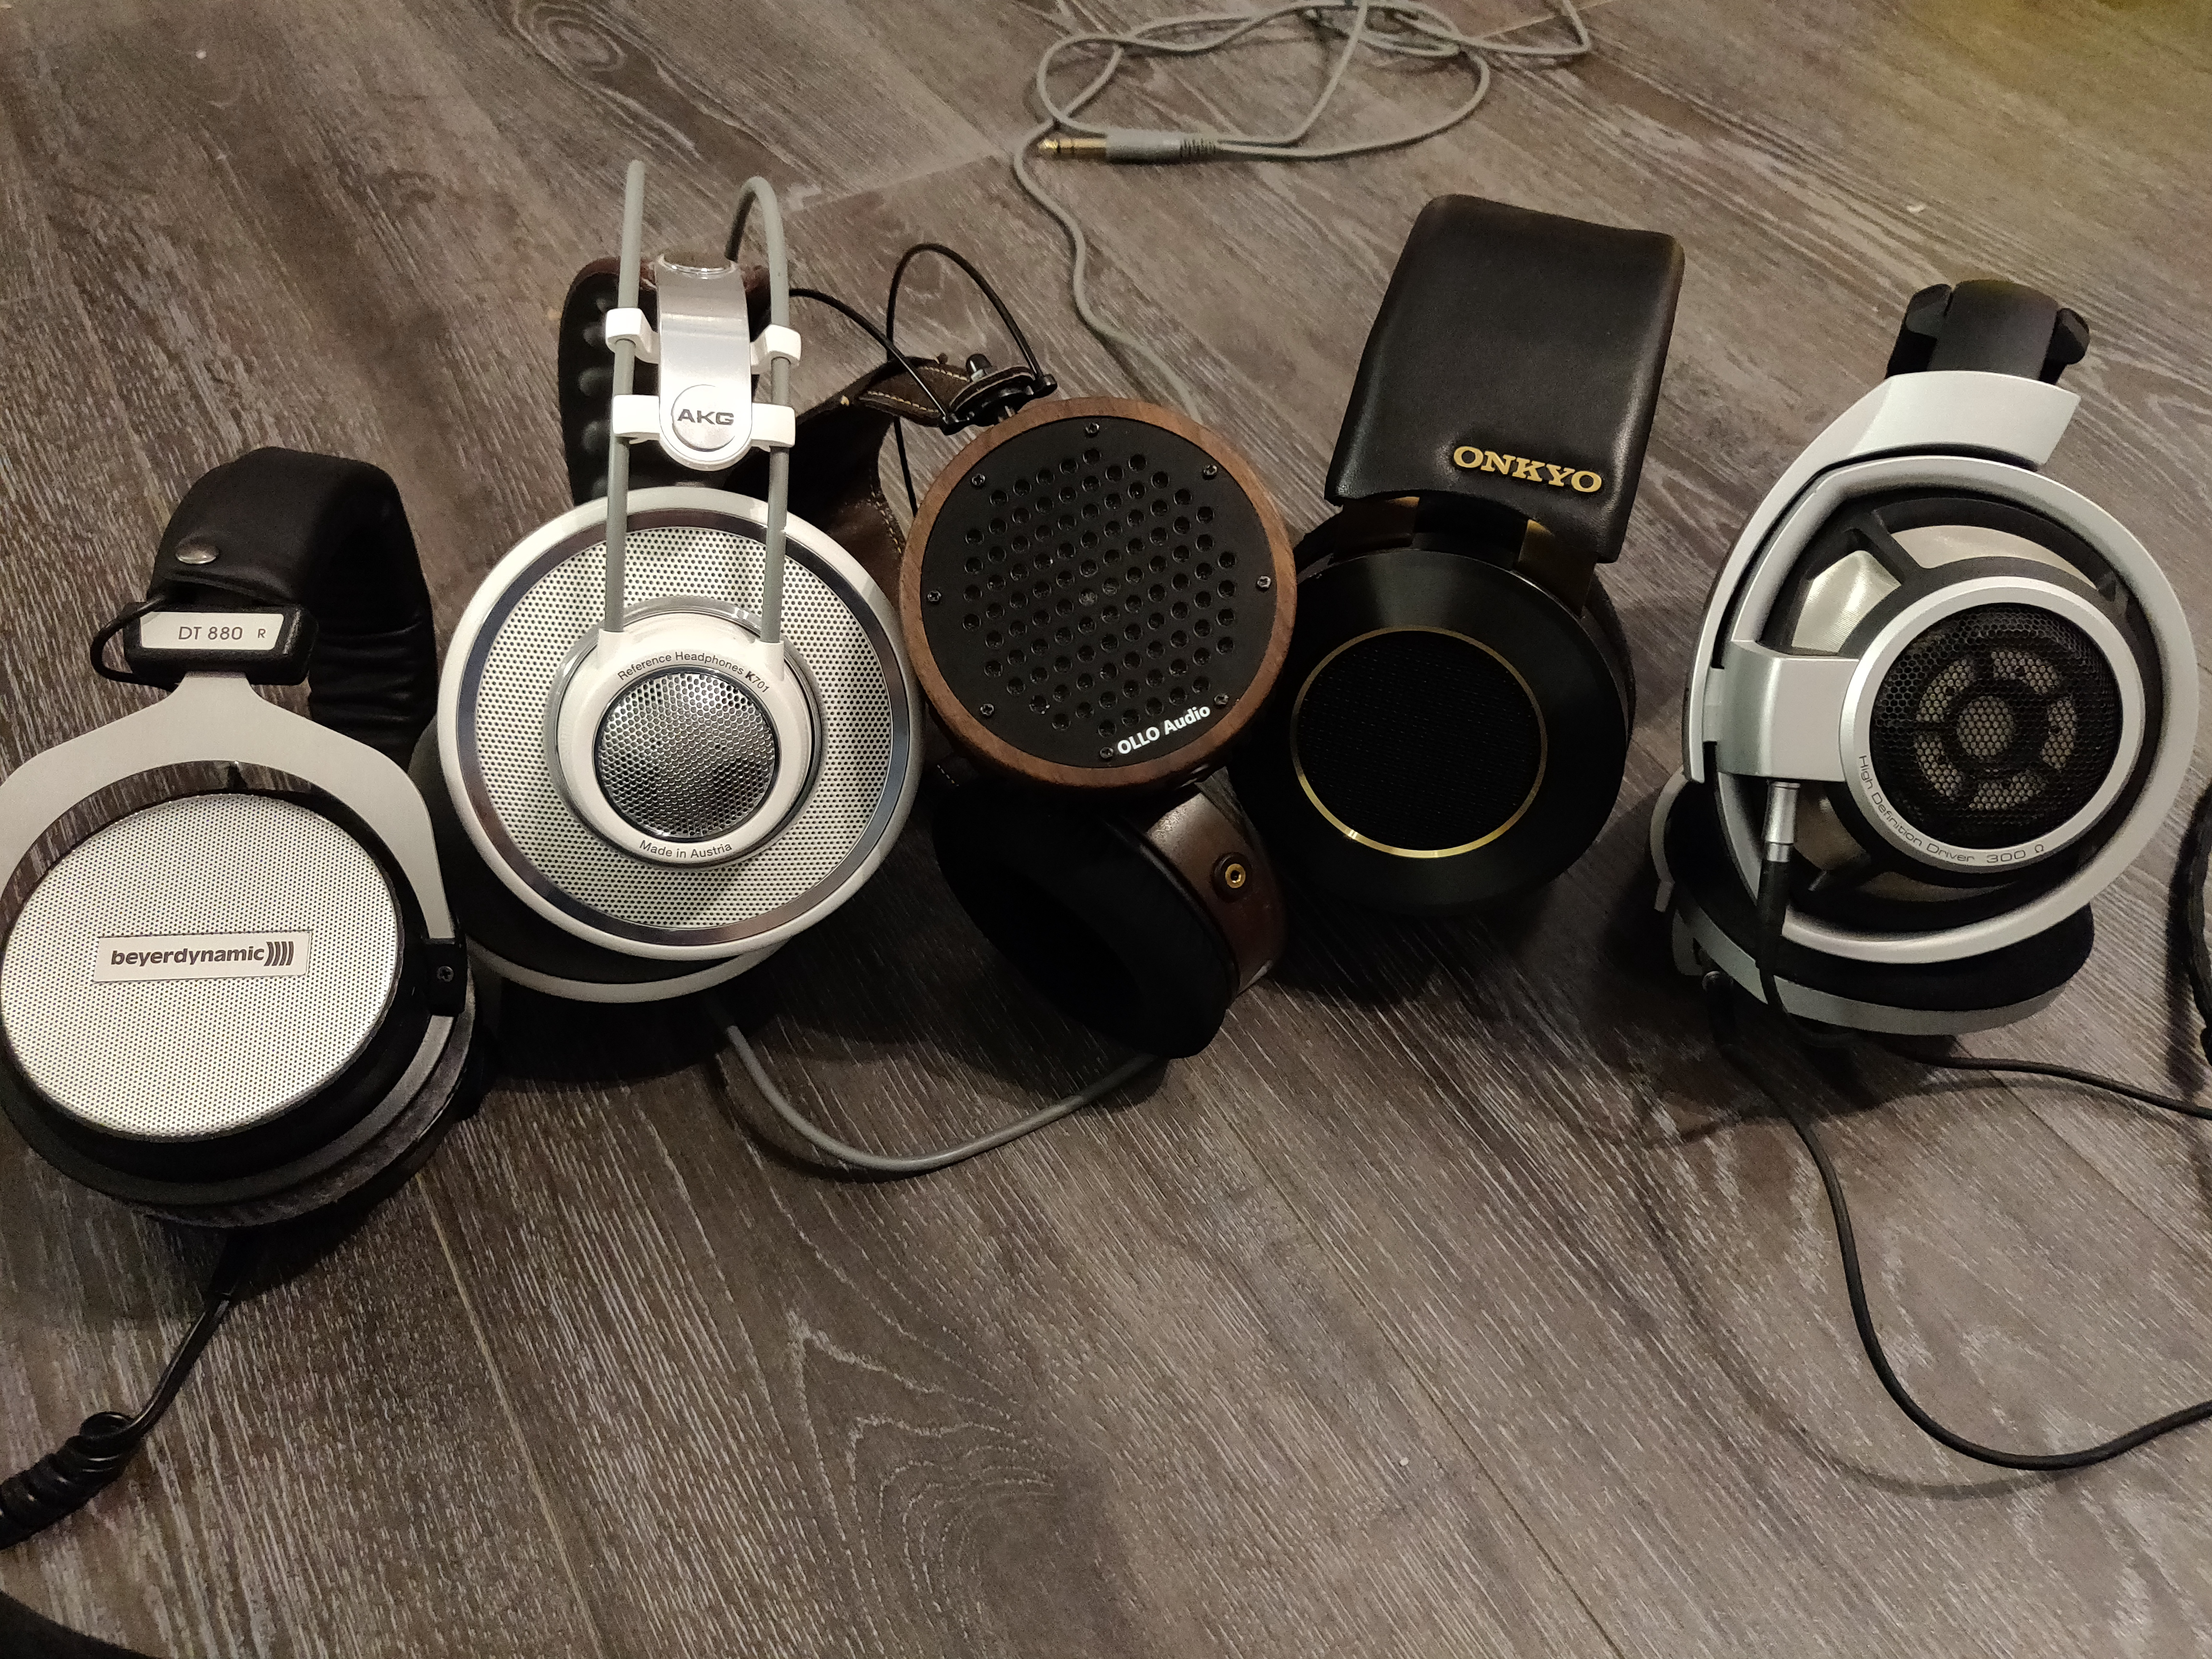 Ollo audio: Pro headphones from Slovenia | Headphone Reviews